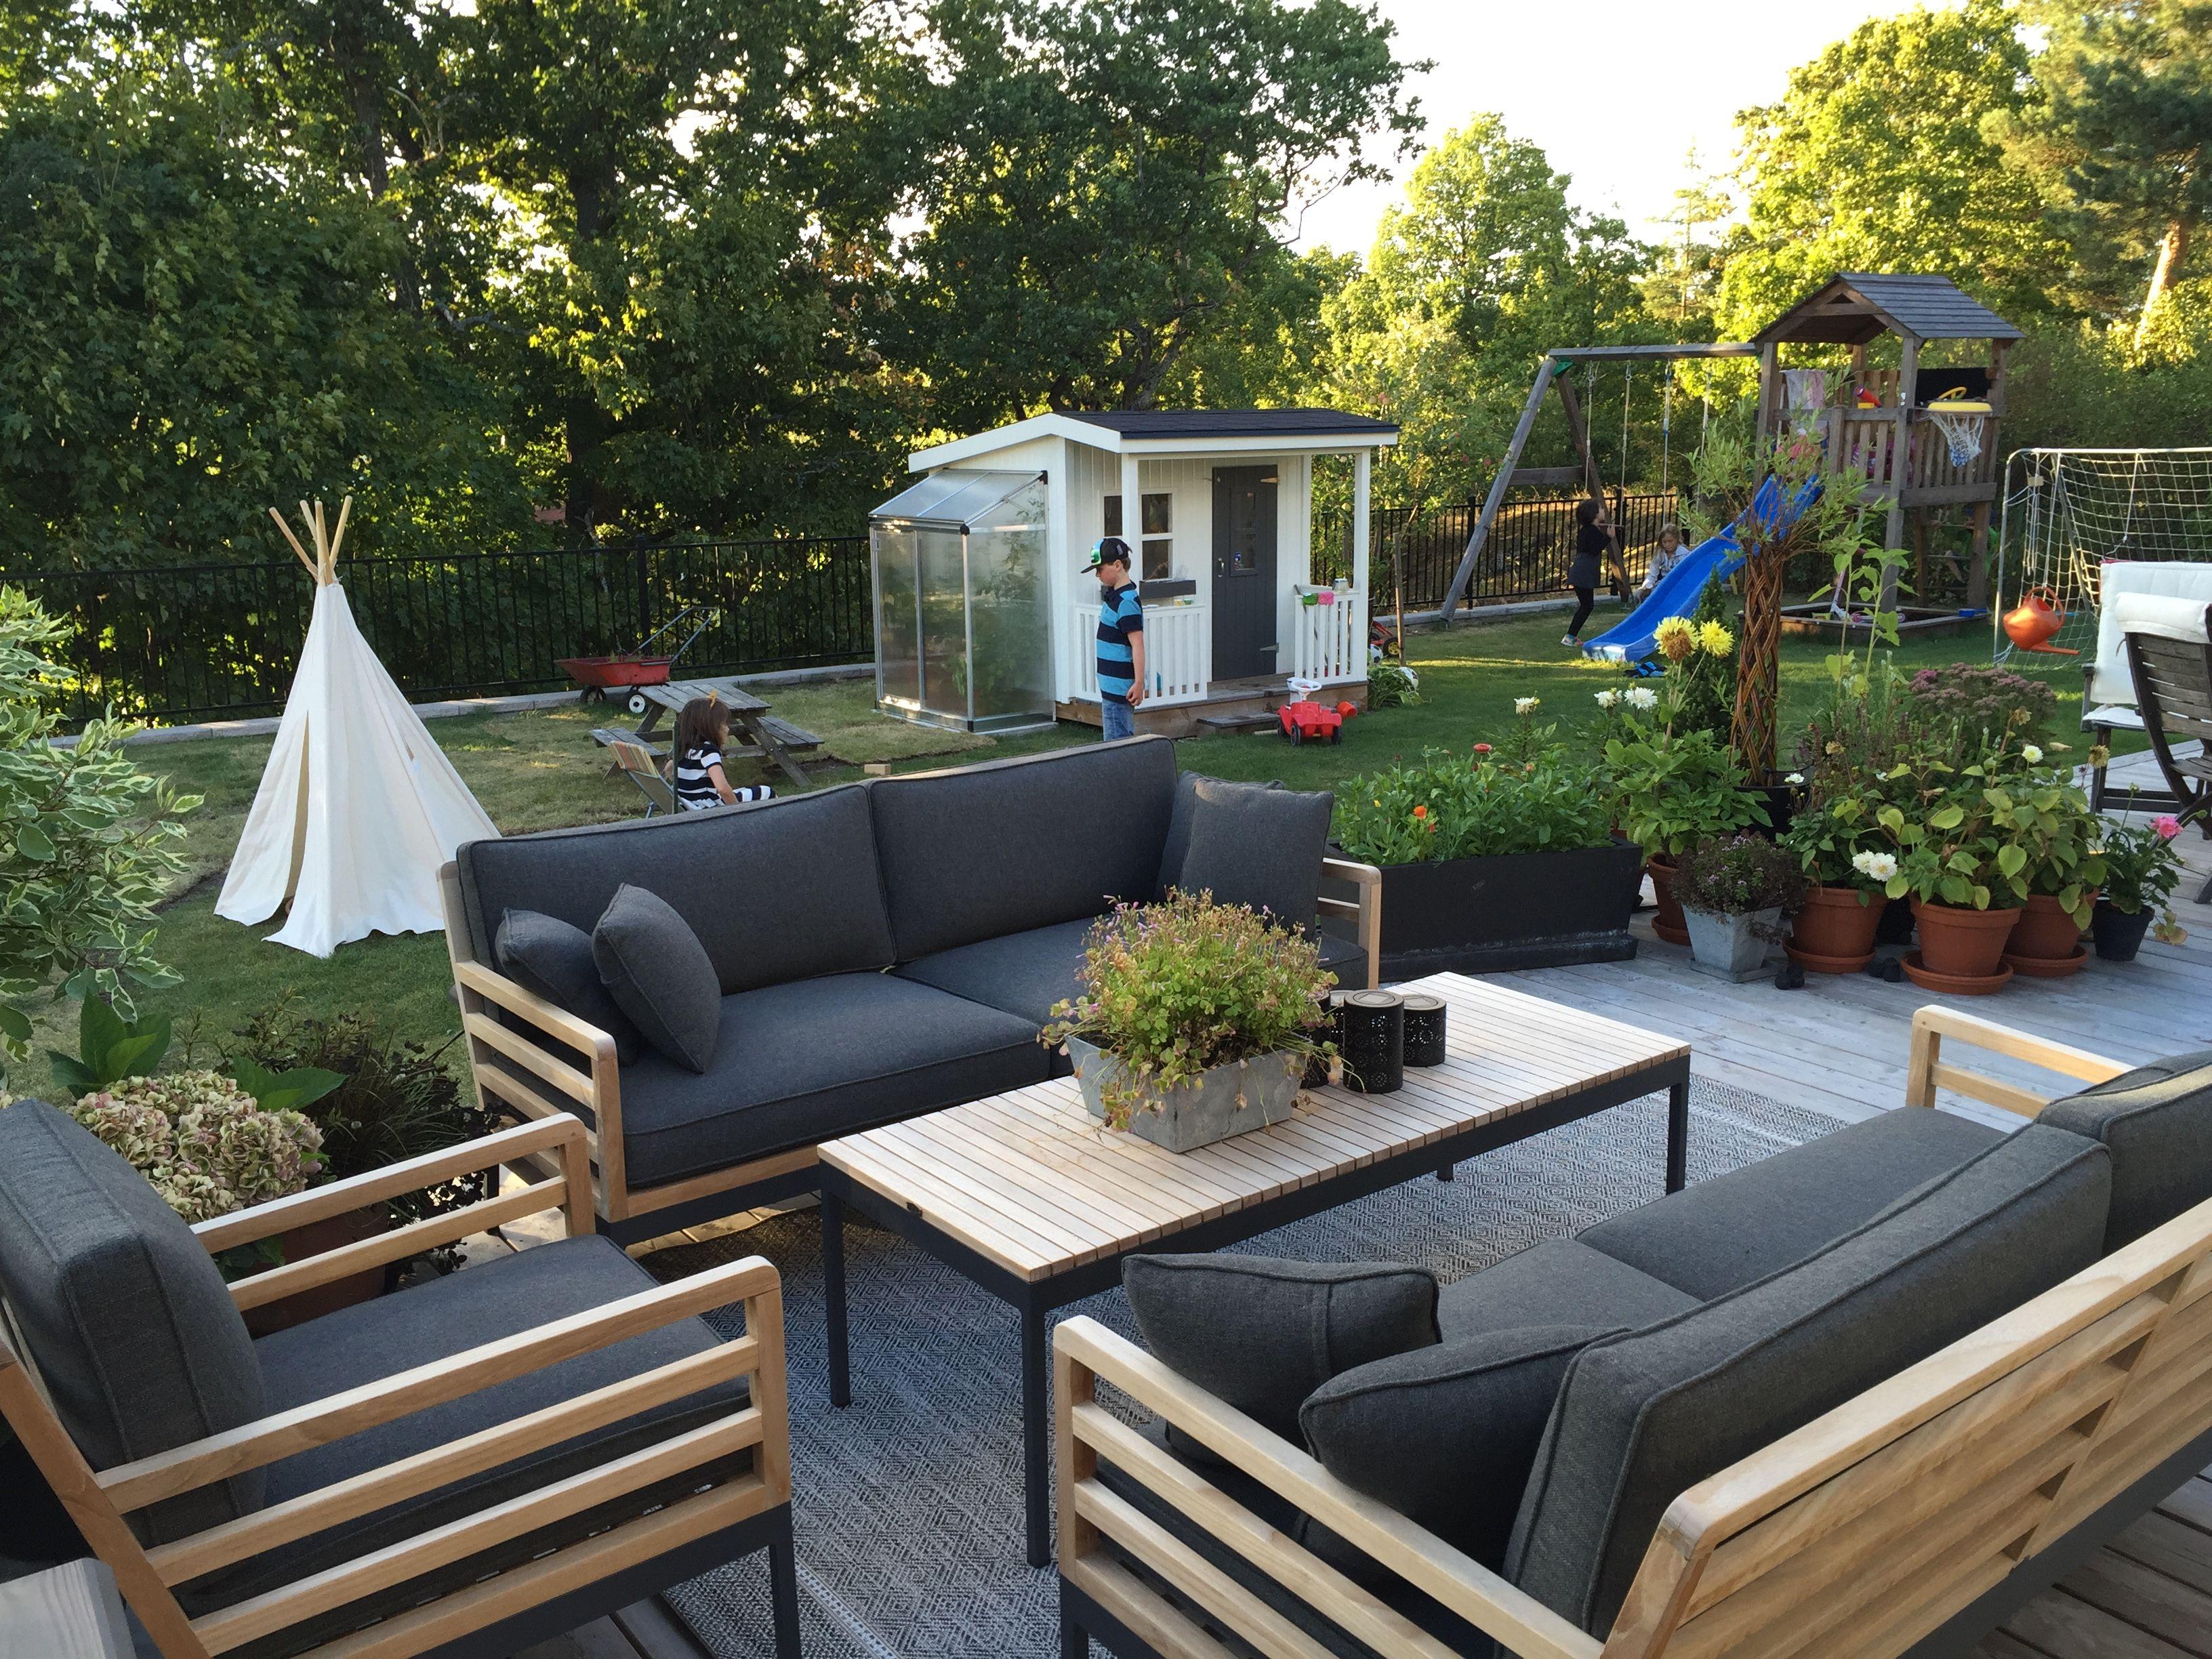 Beautiful Patio Furniture beautiful outdoor seeting area with furniture in teak from brafab